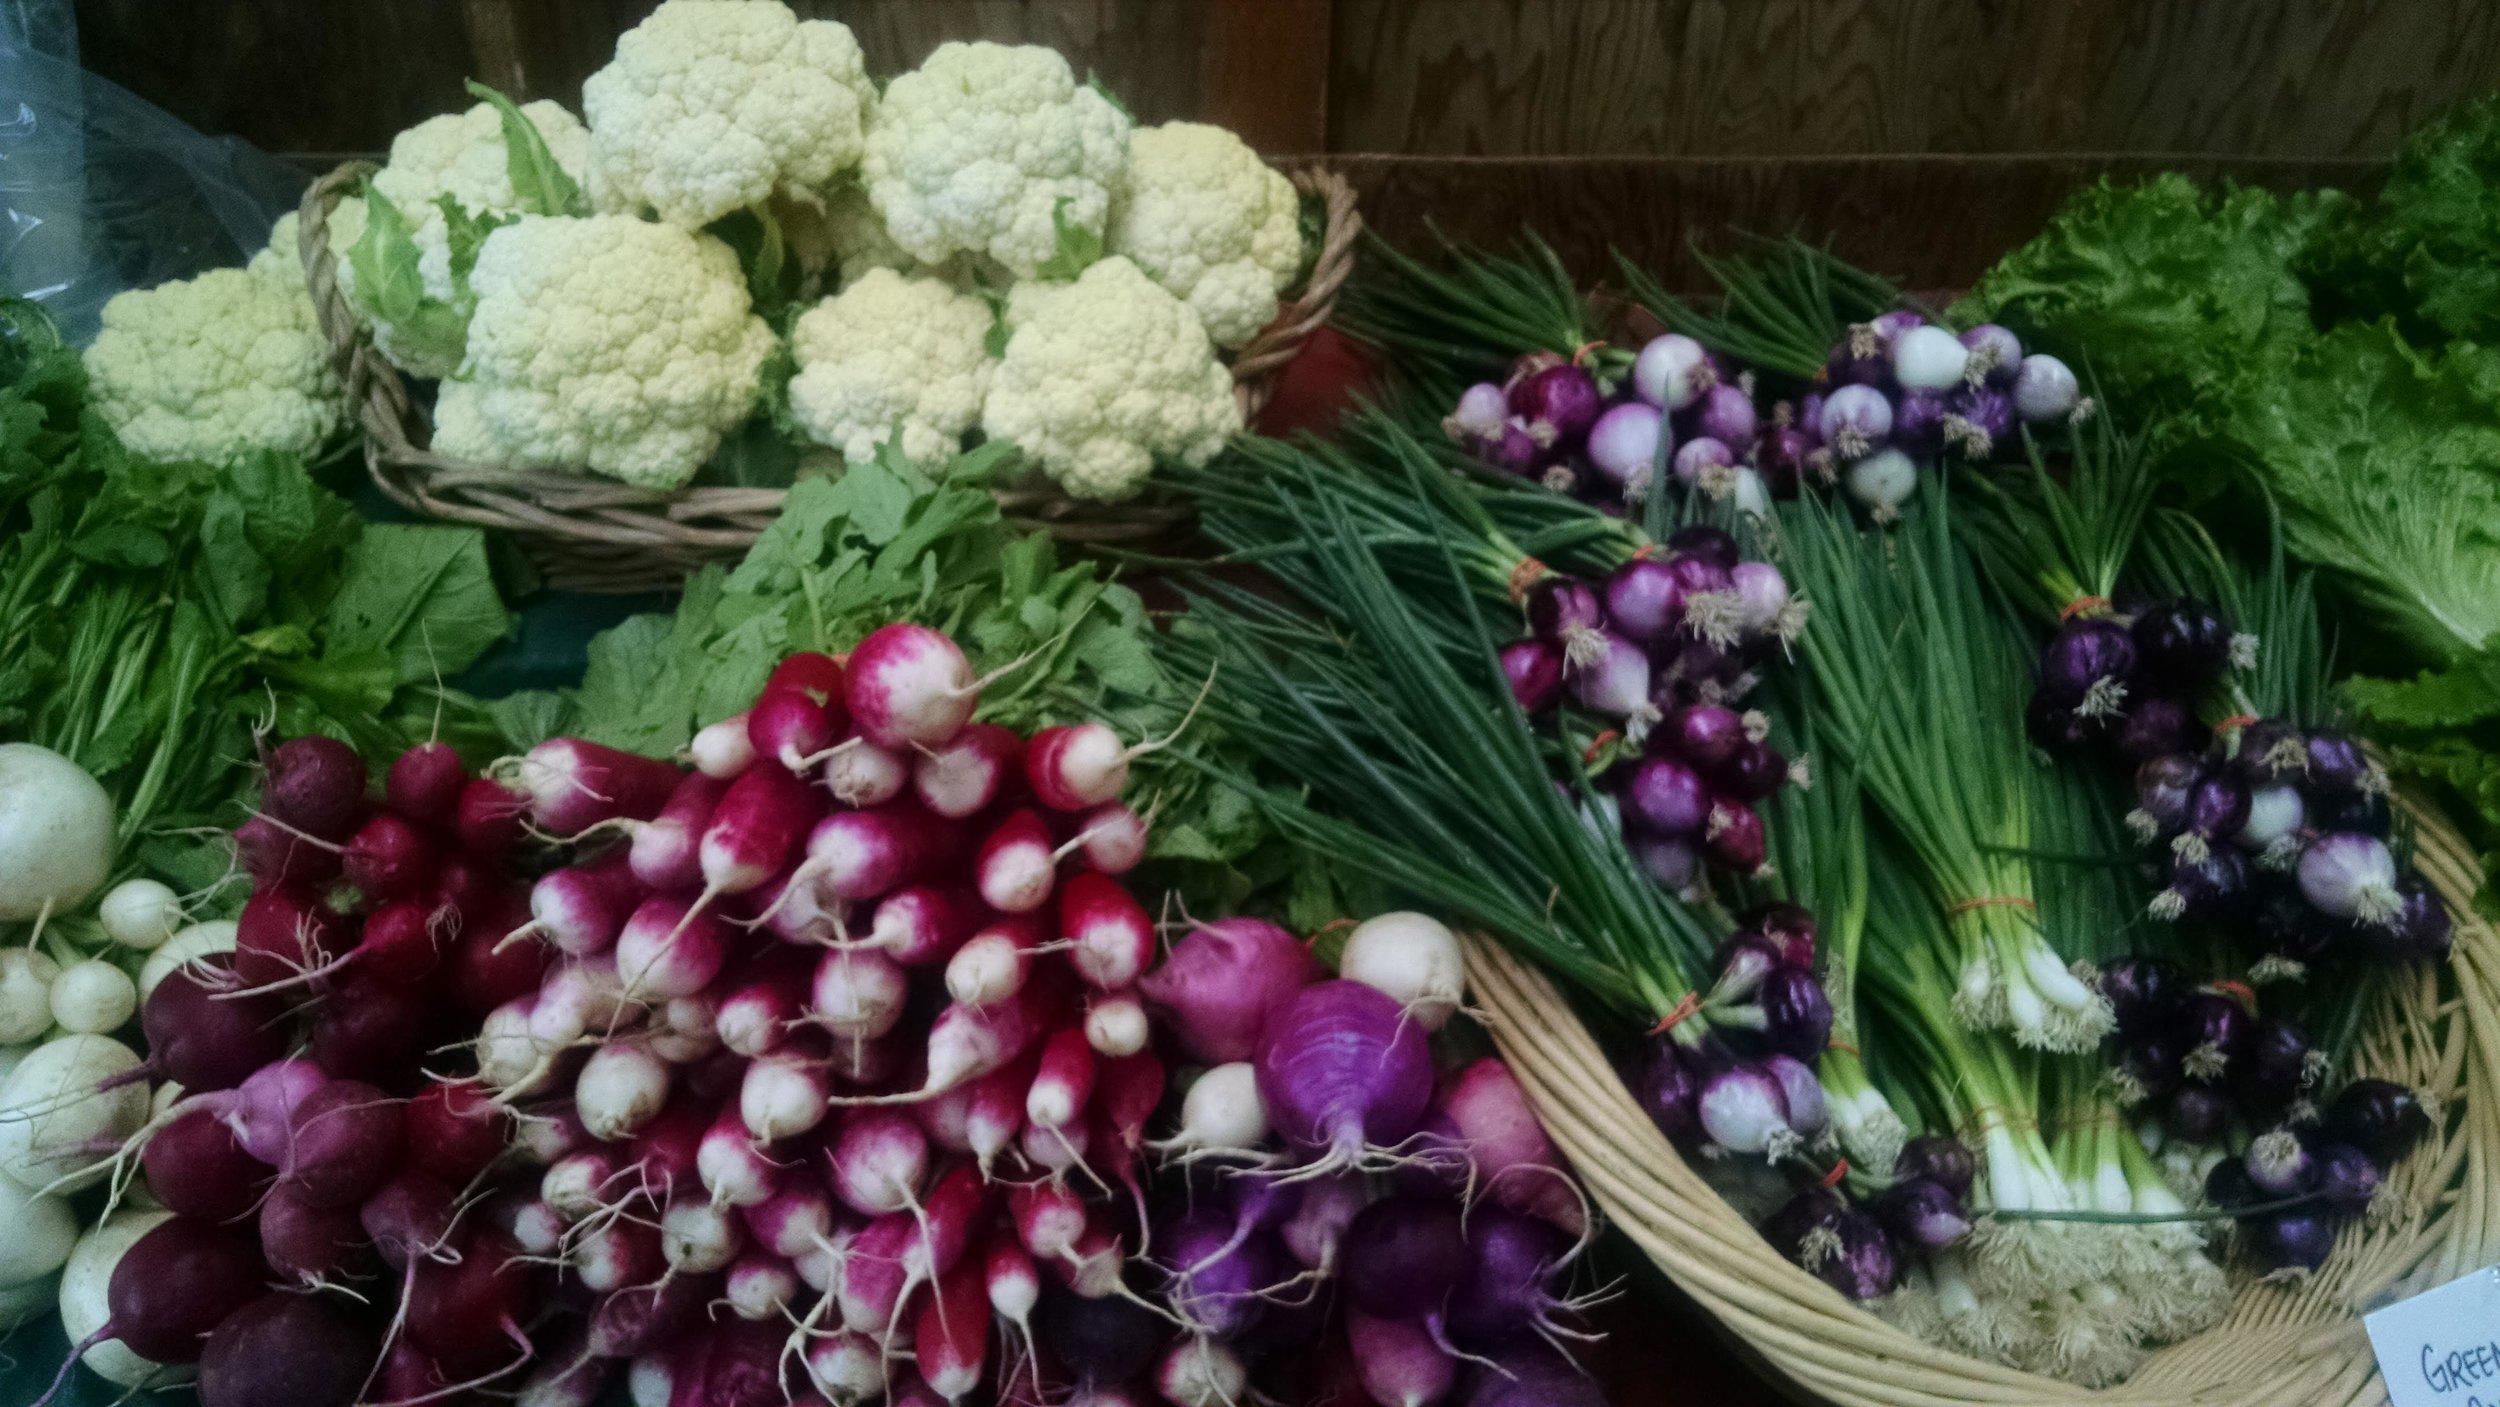 Radish, cauliflower, green onions